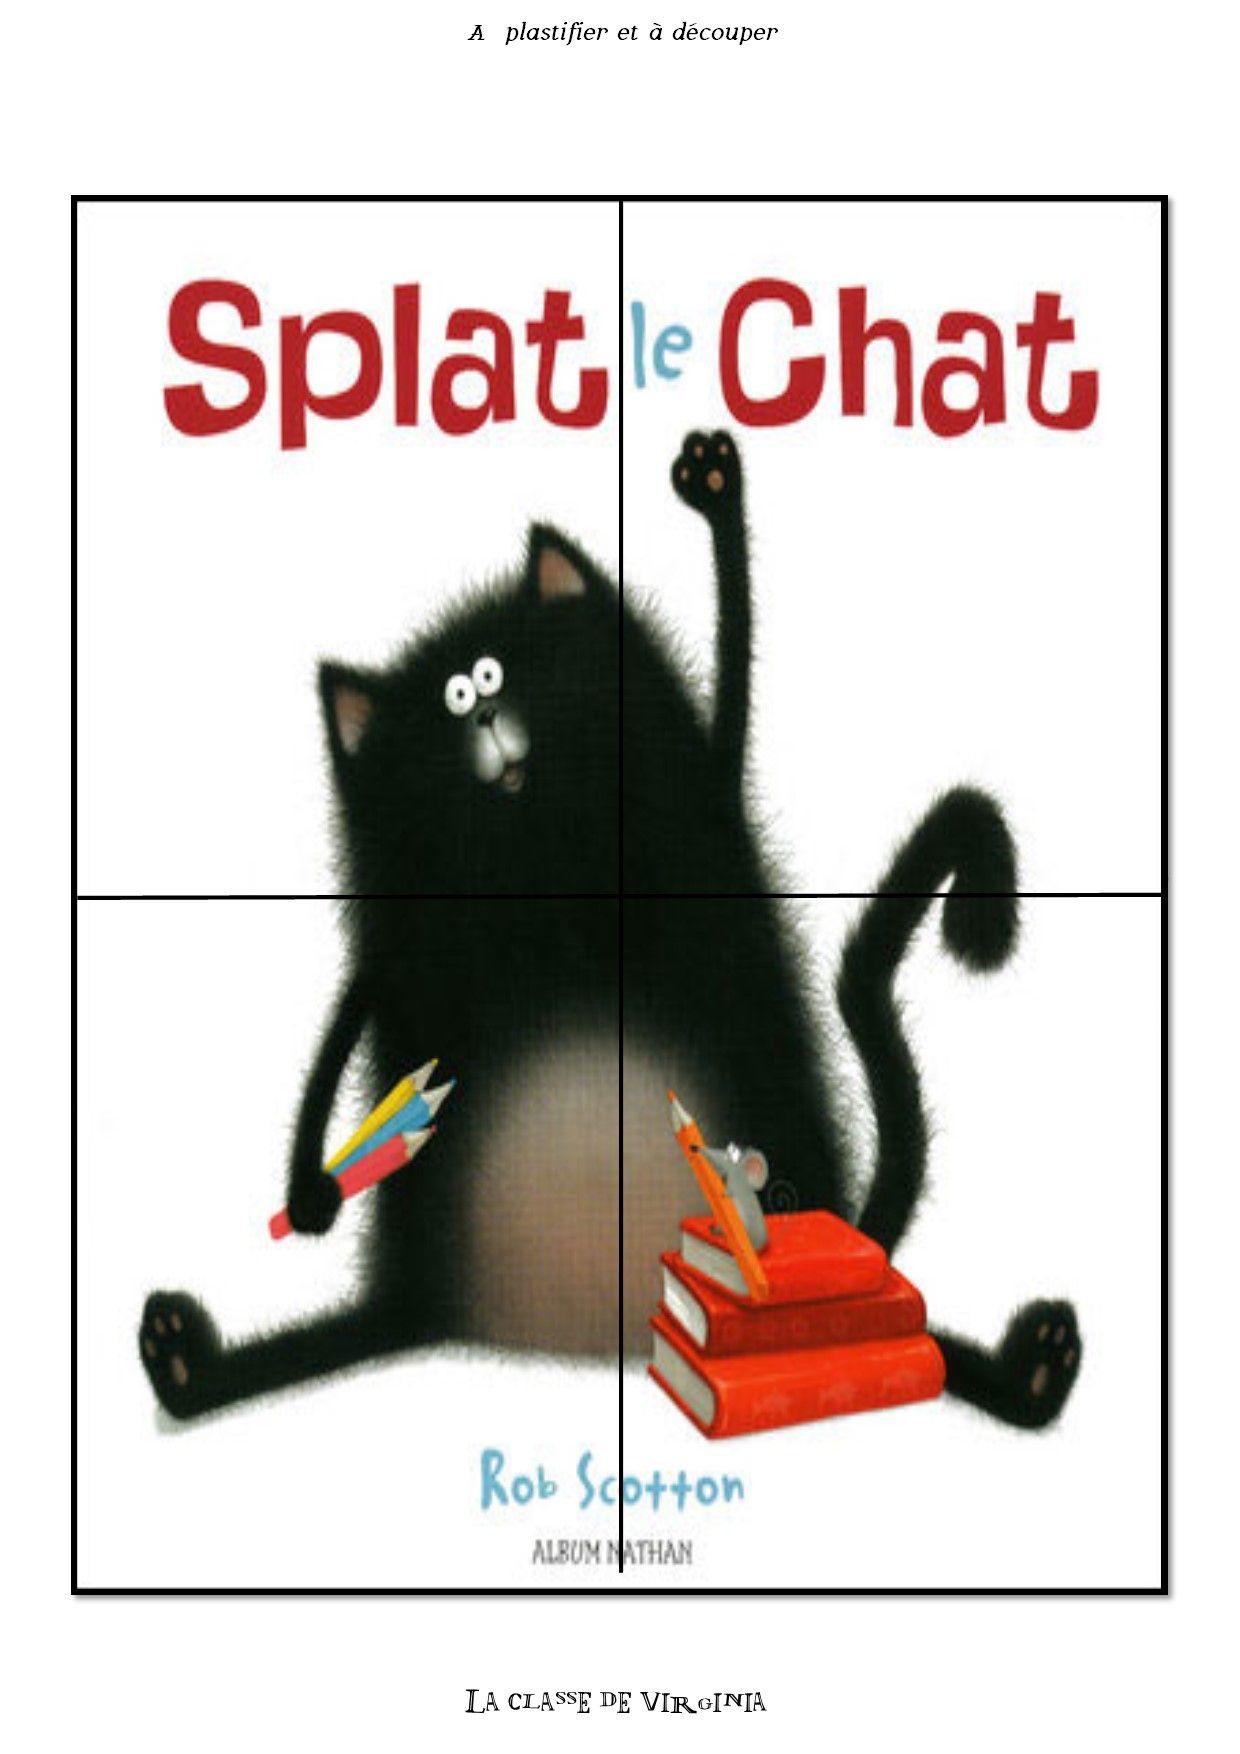 Inspirant Petite Image De Chat A Imprimer